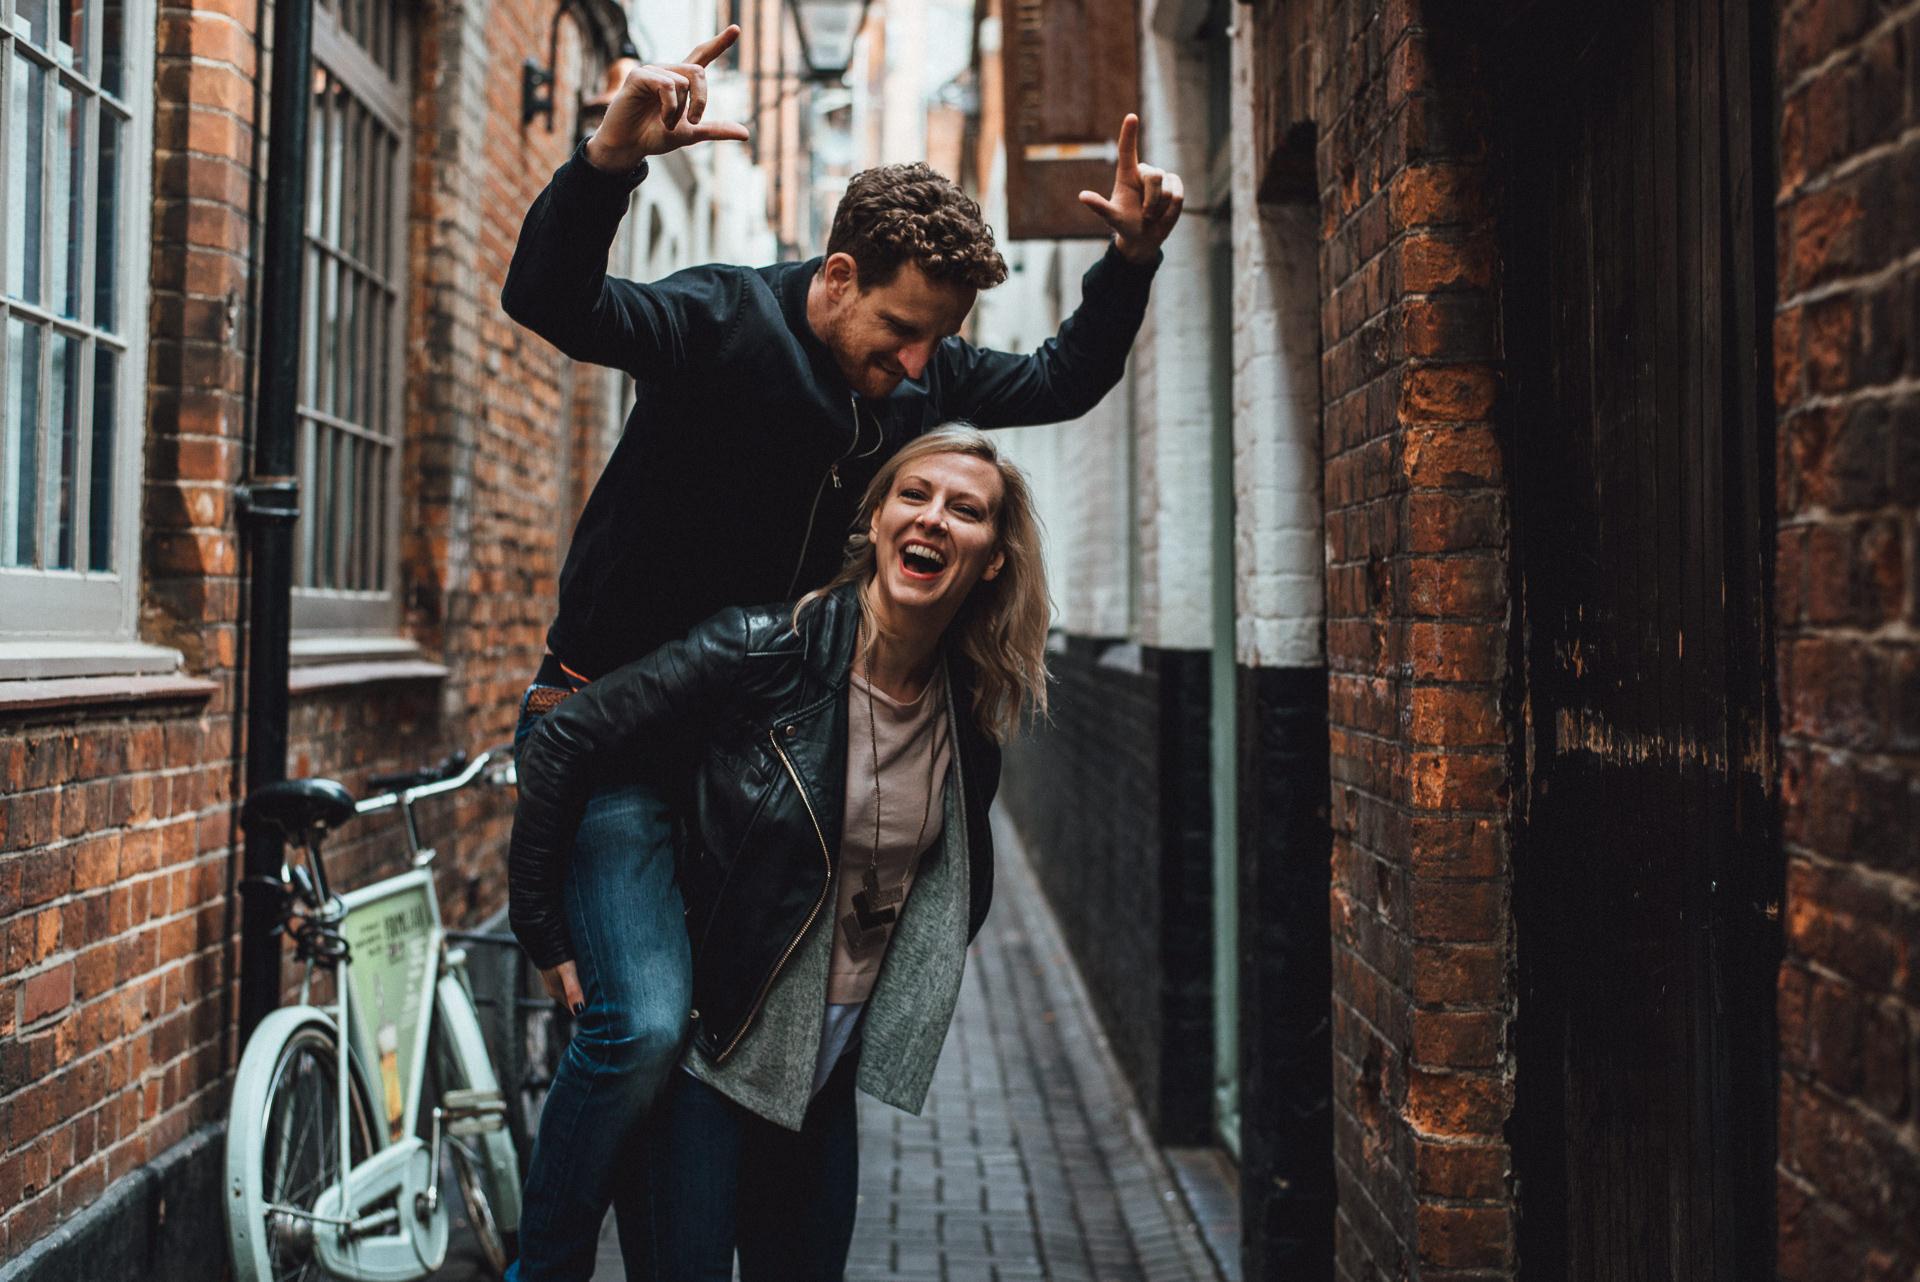 Woman gives man a piggy back. Fun Oxford Engagement shoot